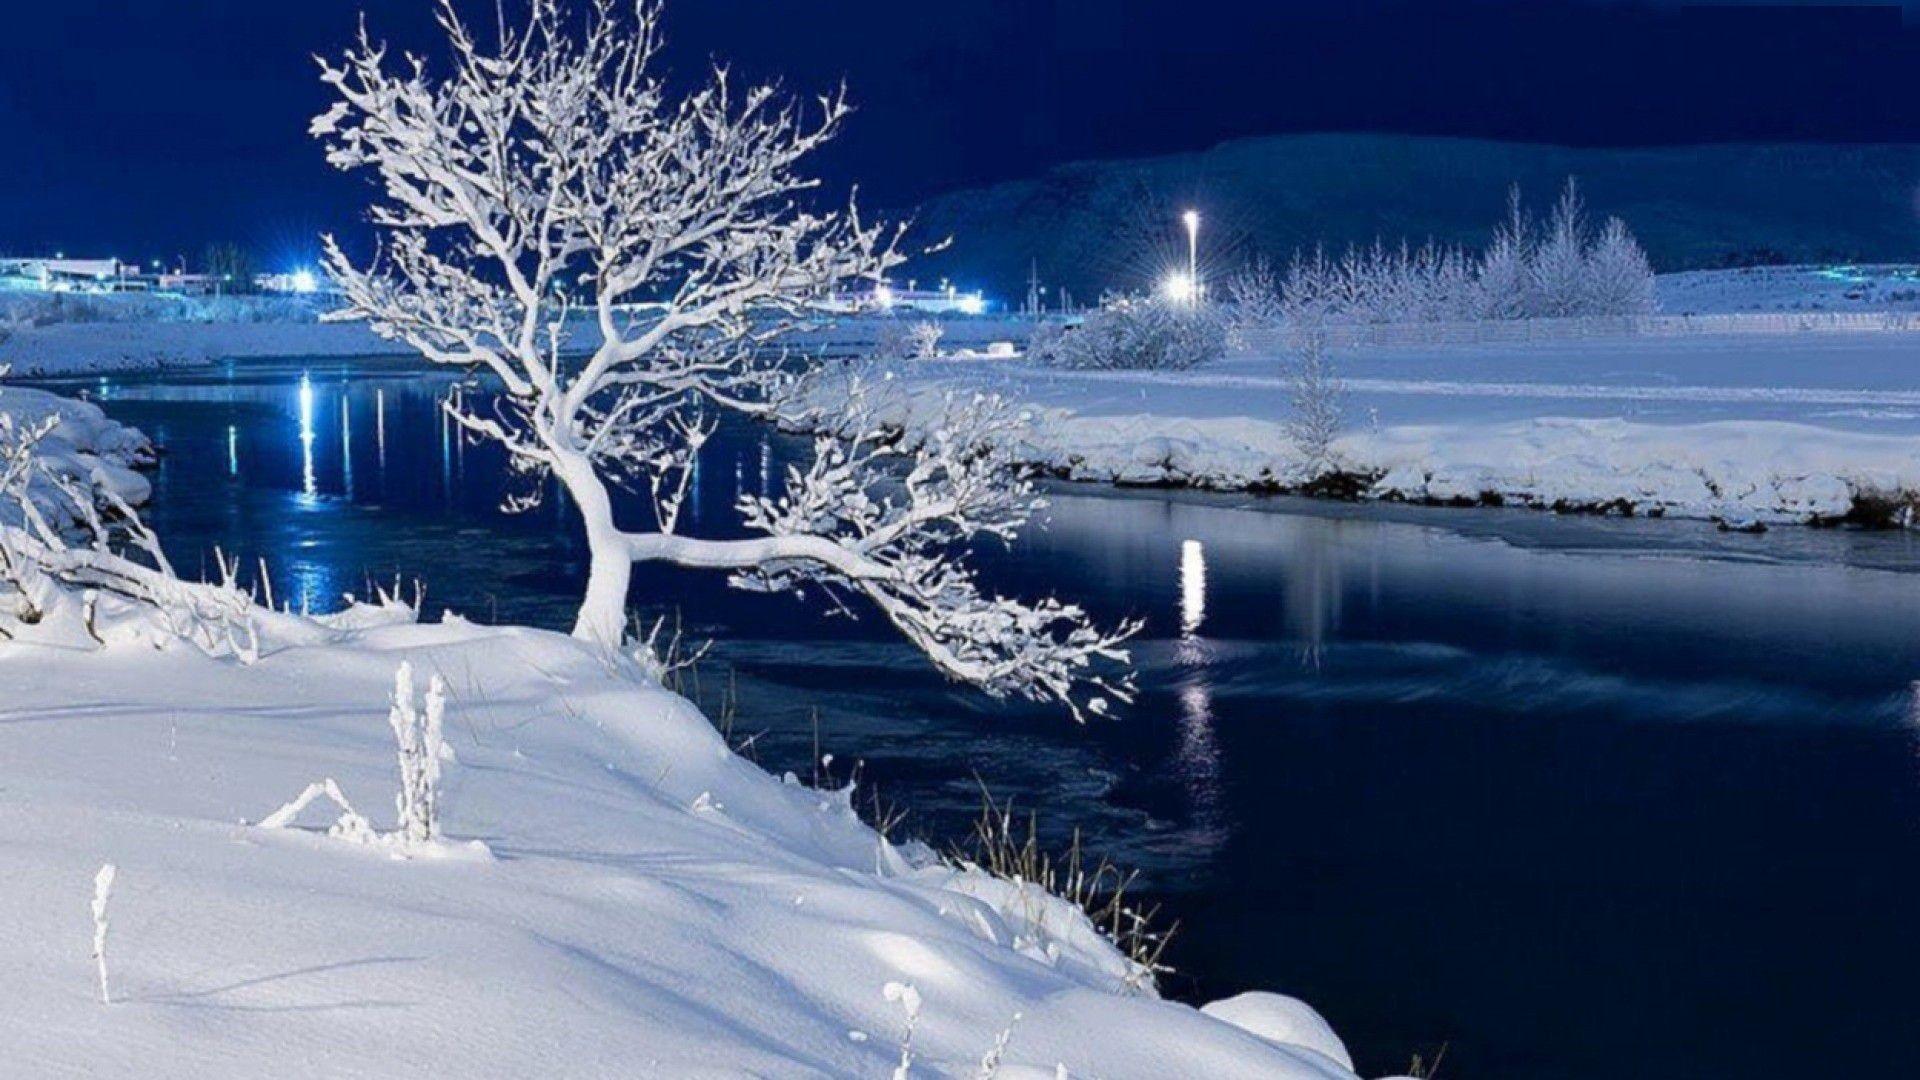 Explore Snow Scenes, Winter Scenes, and more! Frosty Riverside HD Desktop  Background wallpaper free